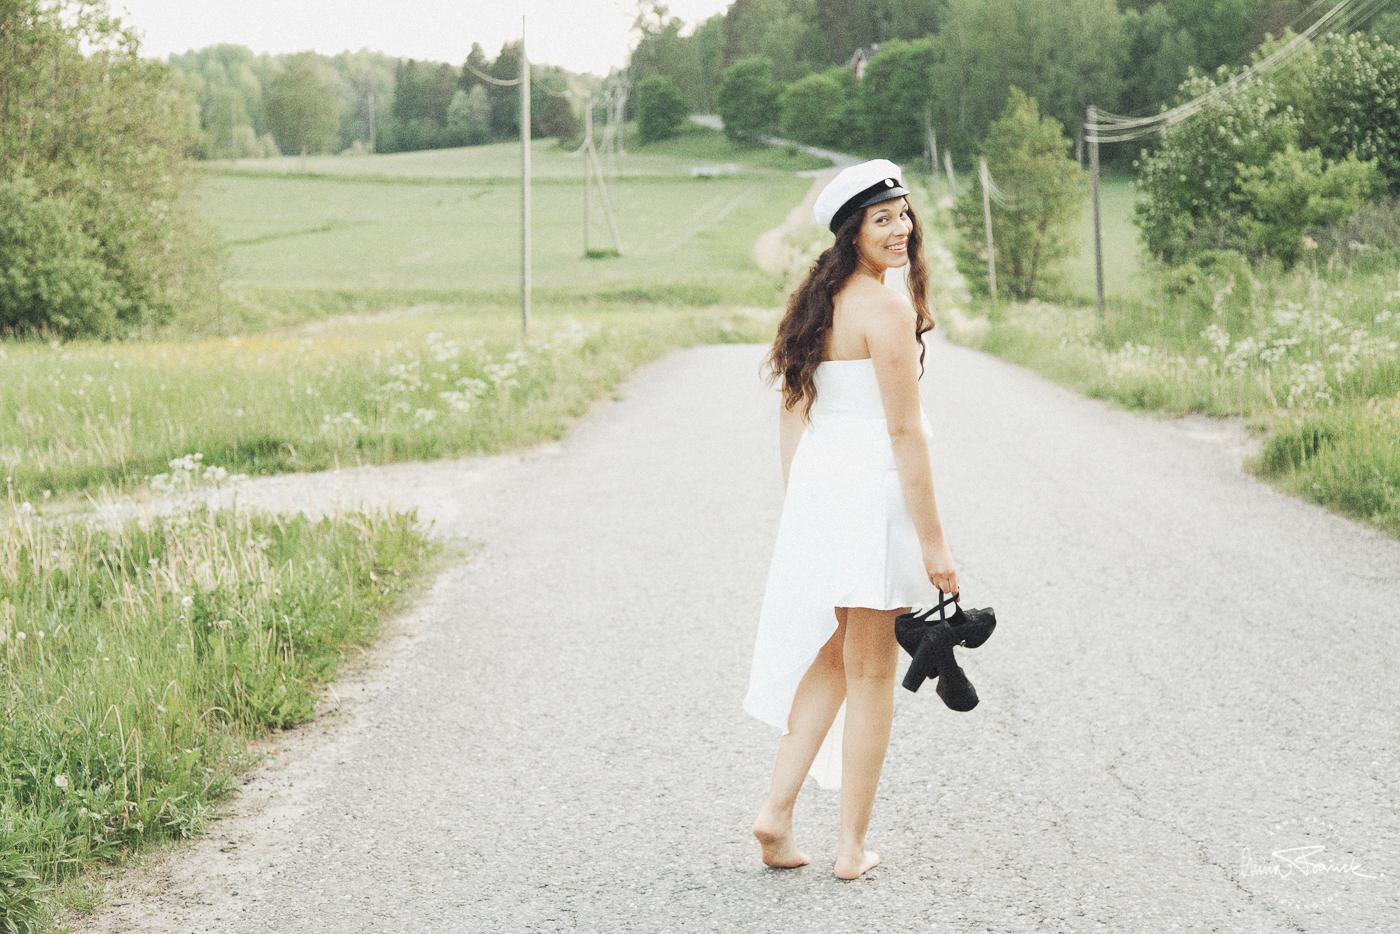 studentfoto, ylioppilas, porträtt, muotokuva, portrait, fotografering, valokuvaus, photography, anna, franck, pargas, parainen, finland, suomi, summer, kesä, sommar, stockholm, fotograf